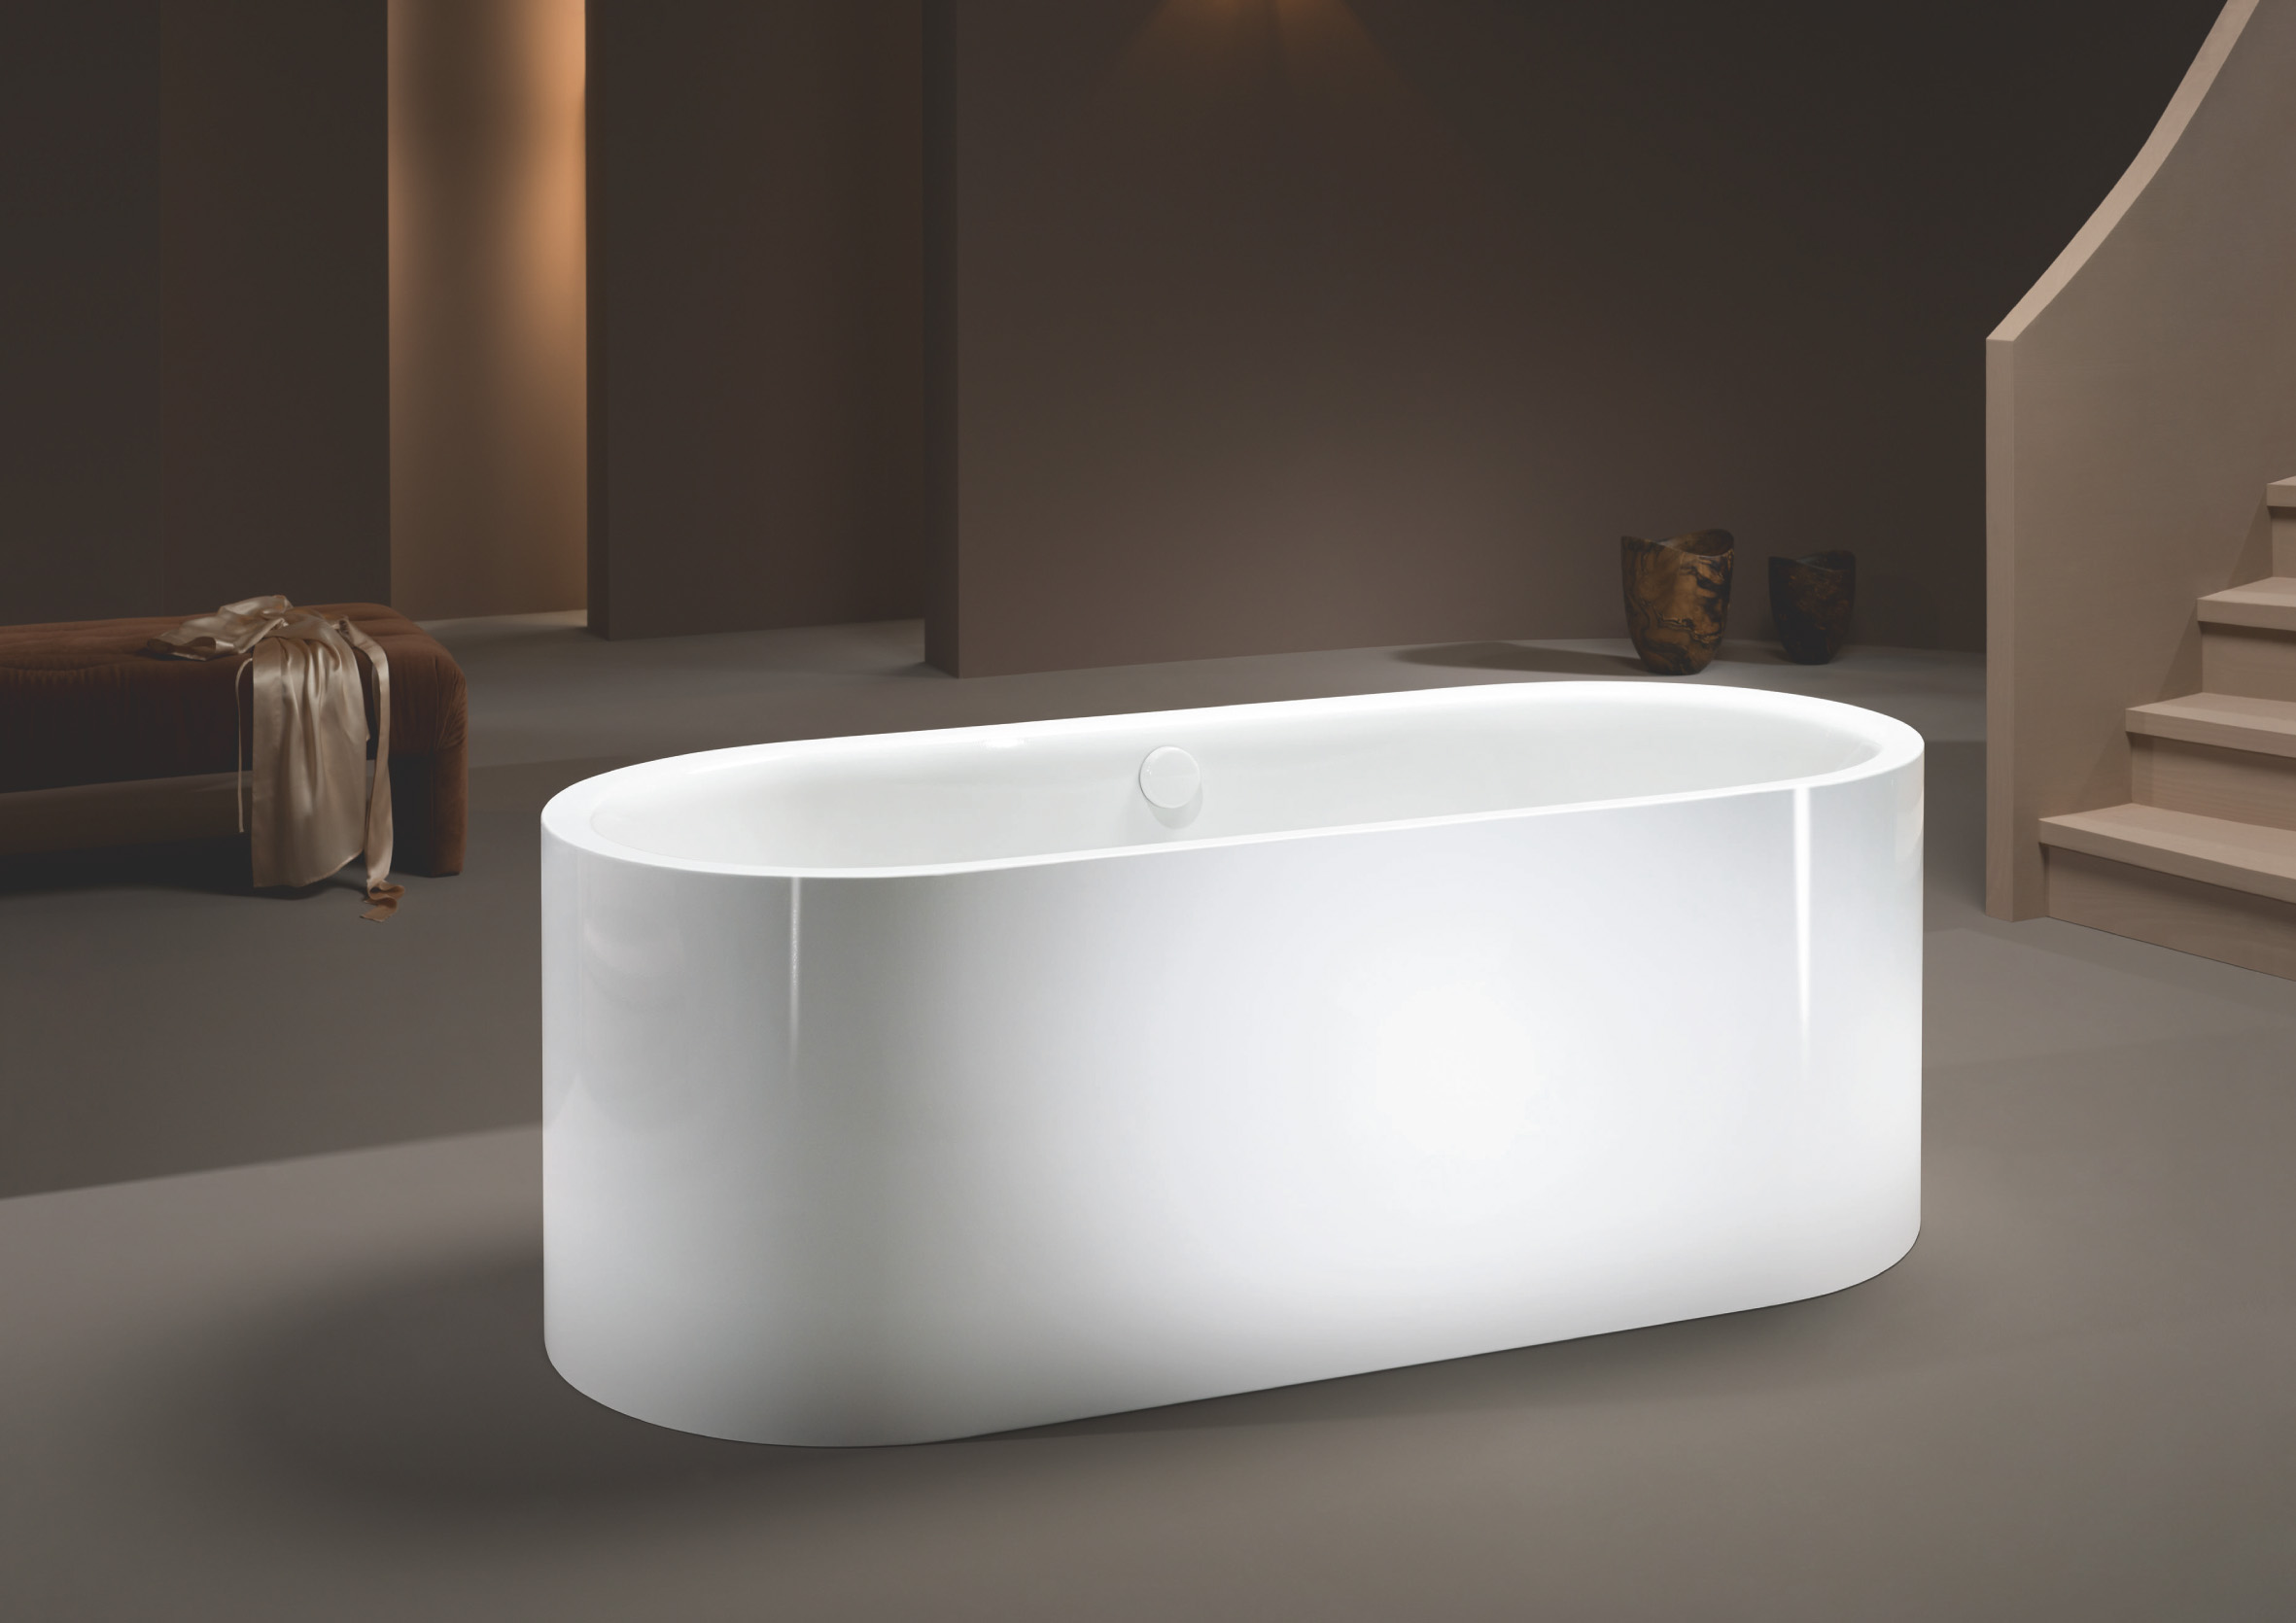 kaldewei presents new masterpieces premium range the. Black Bedroom Furniture Sets. Home Design Ideas